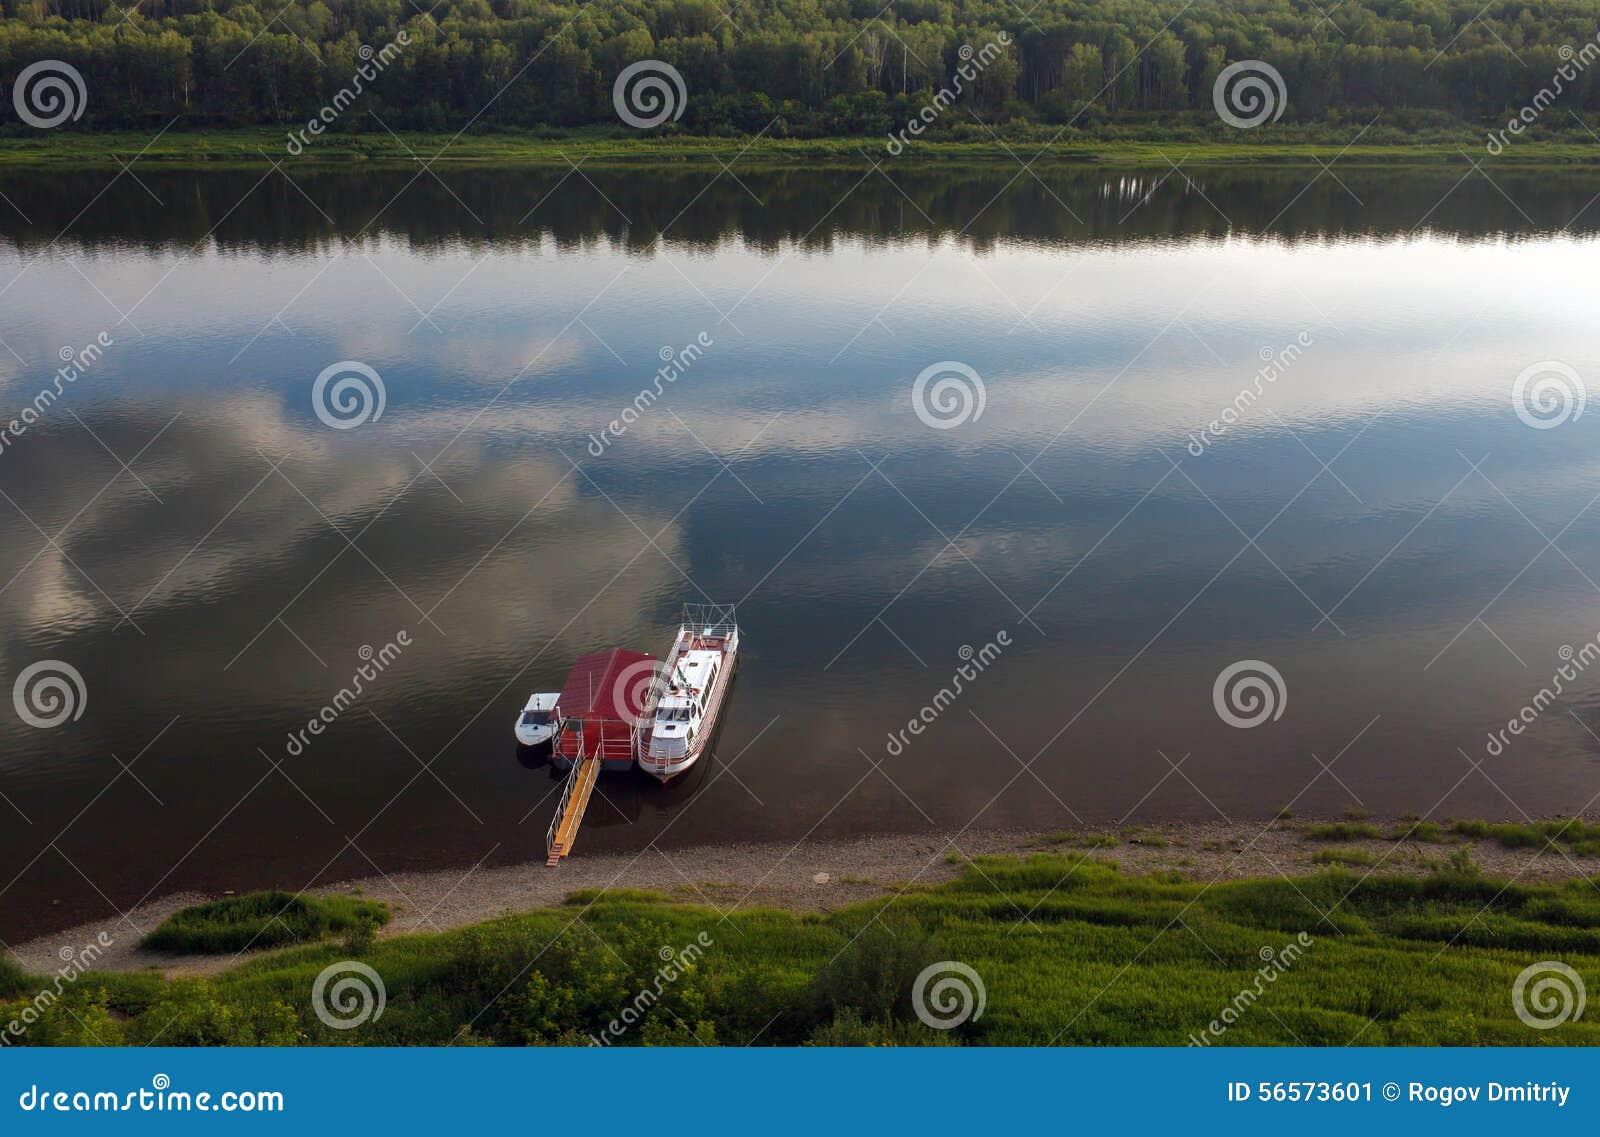 Download Βάρκα που δένεται τη θερινή ημέρα, ποταμός Στοκ Εικόνα - εικόνα από ικανότητα, ημέρα: 56573601